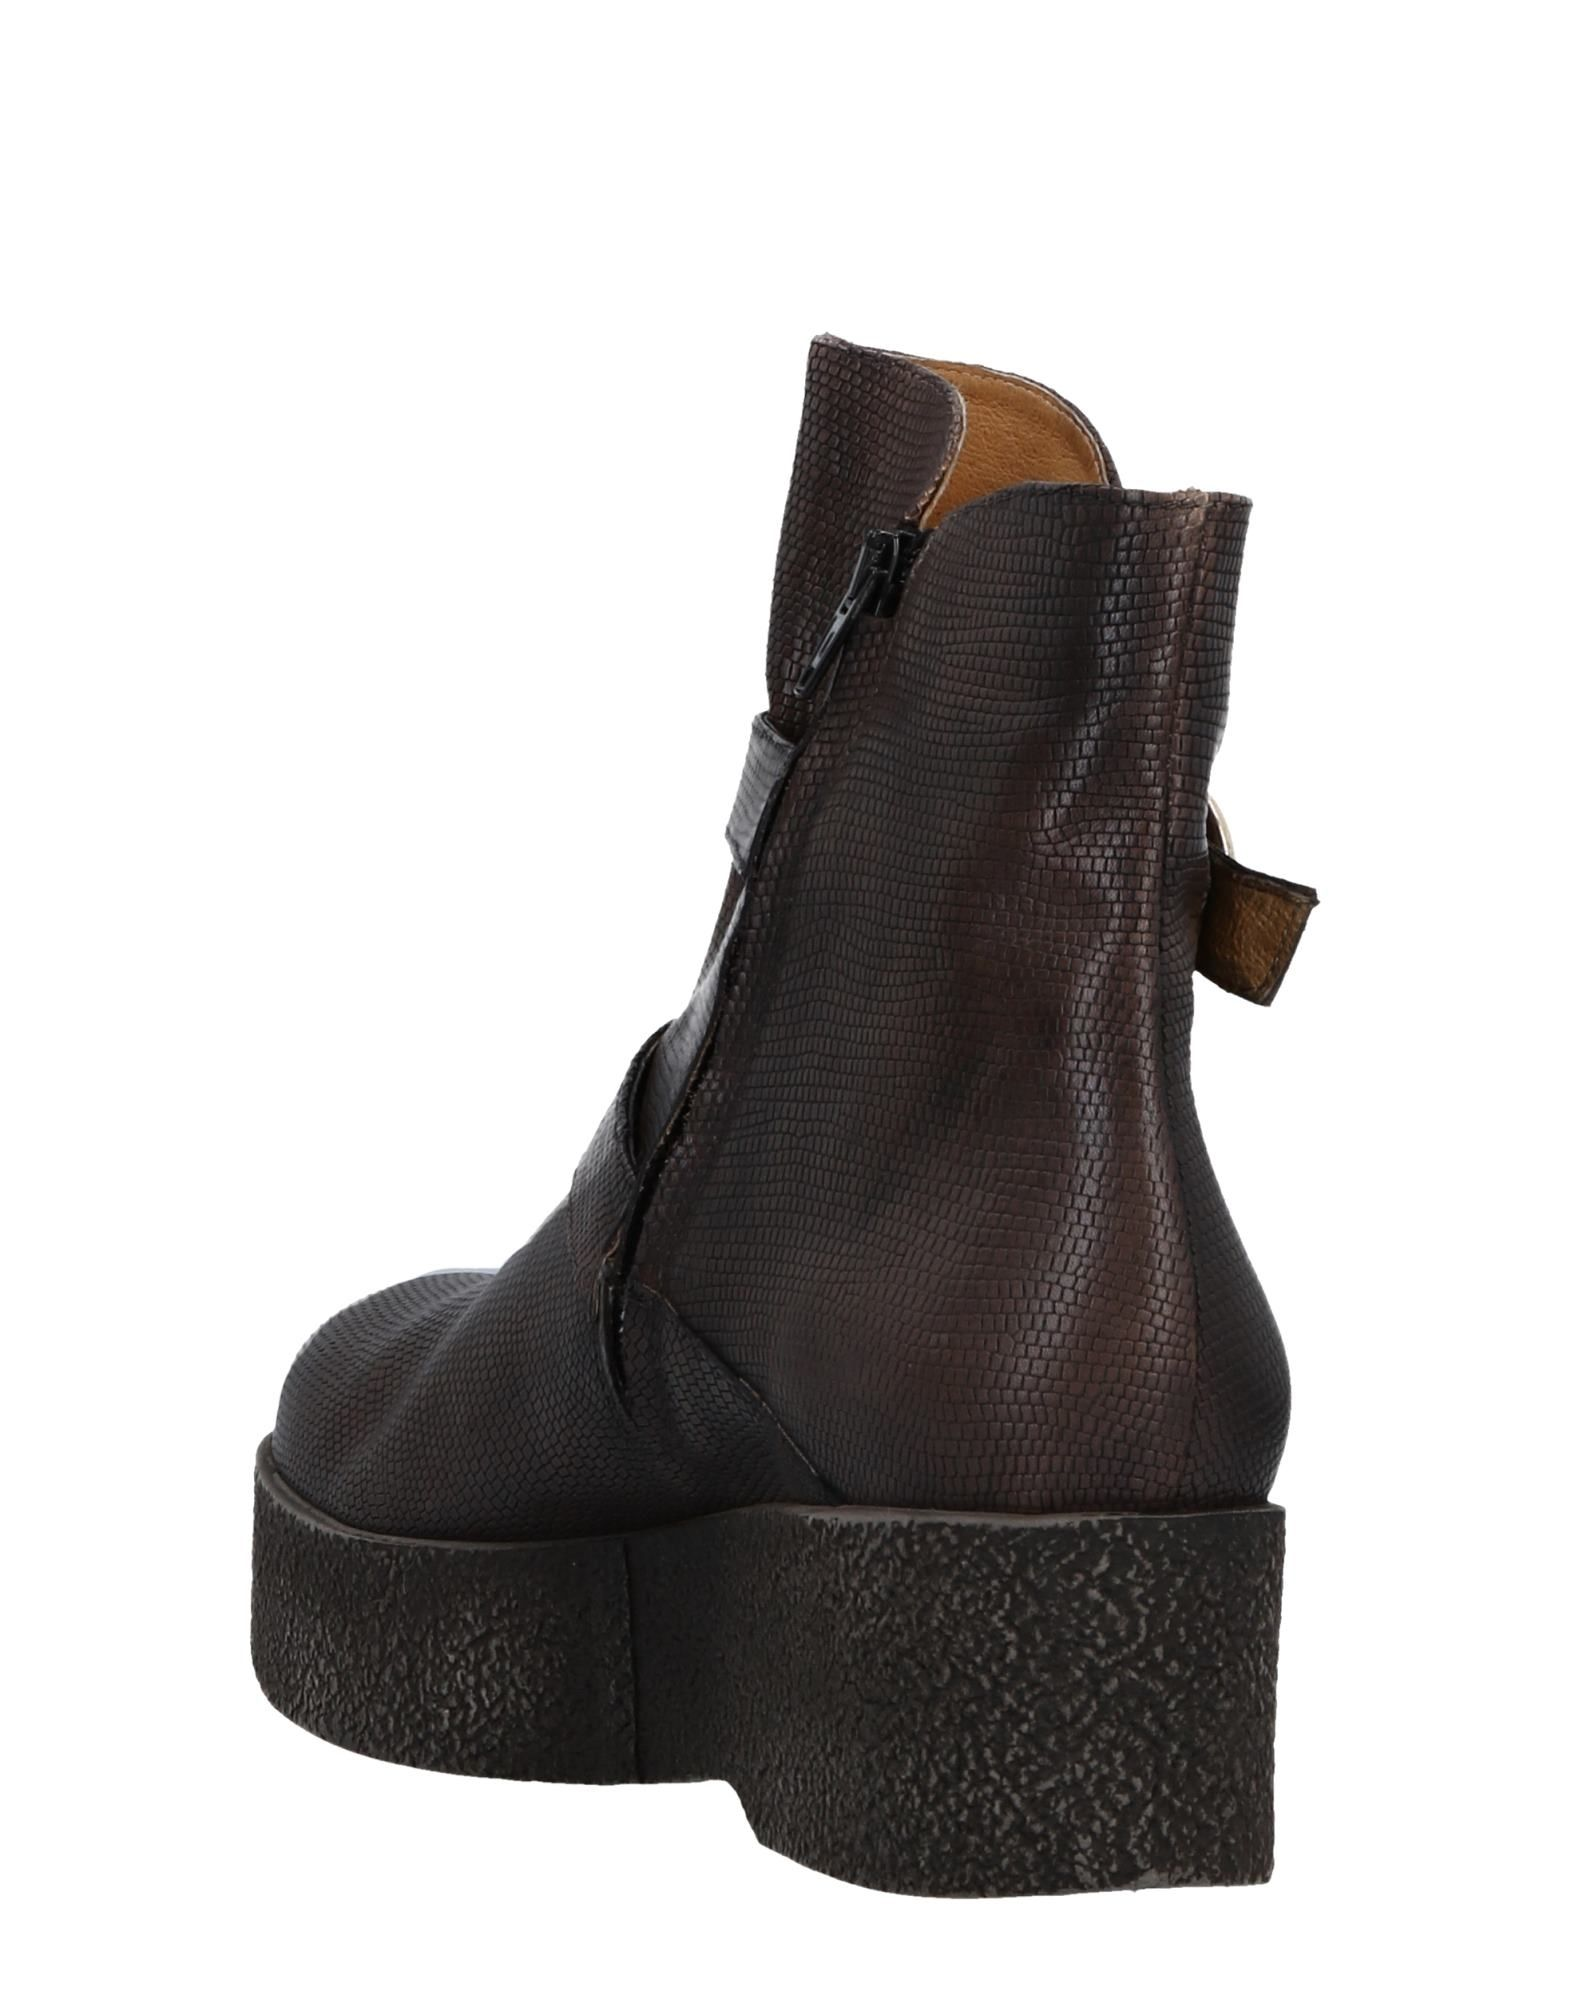 Gut um billige Schuhe zu 11512095RN tragenPf16 Stiefelette Damen  11512095RN zu 047e02